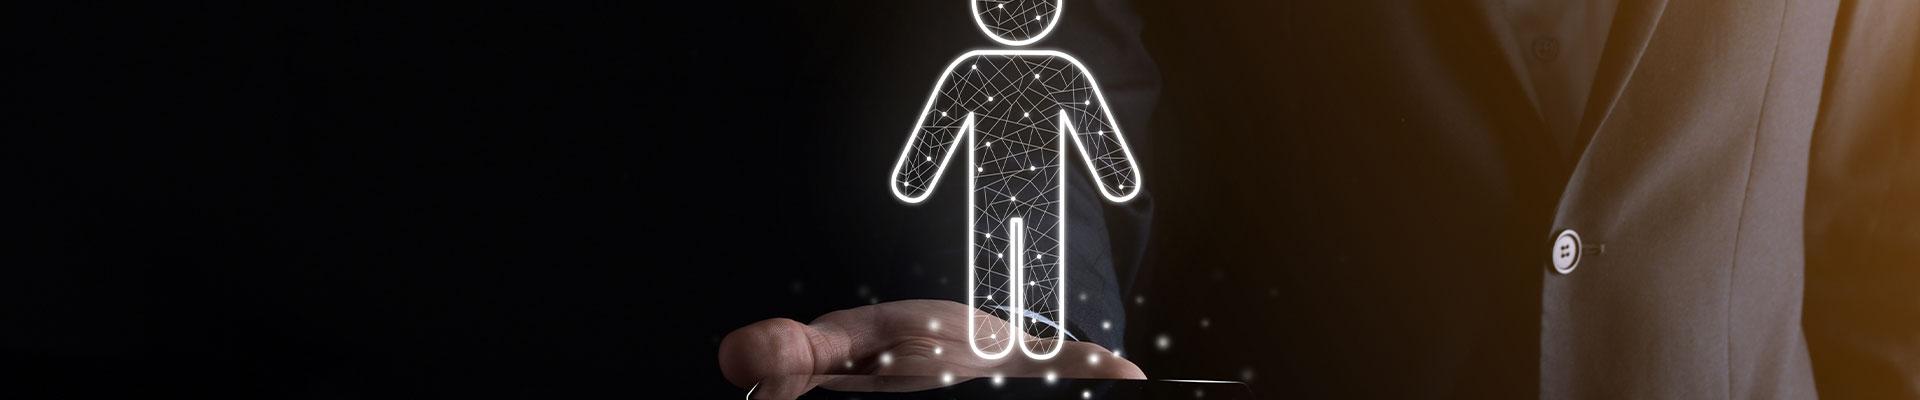 crm-digital-transformation-trends